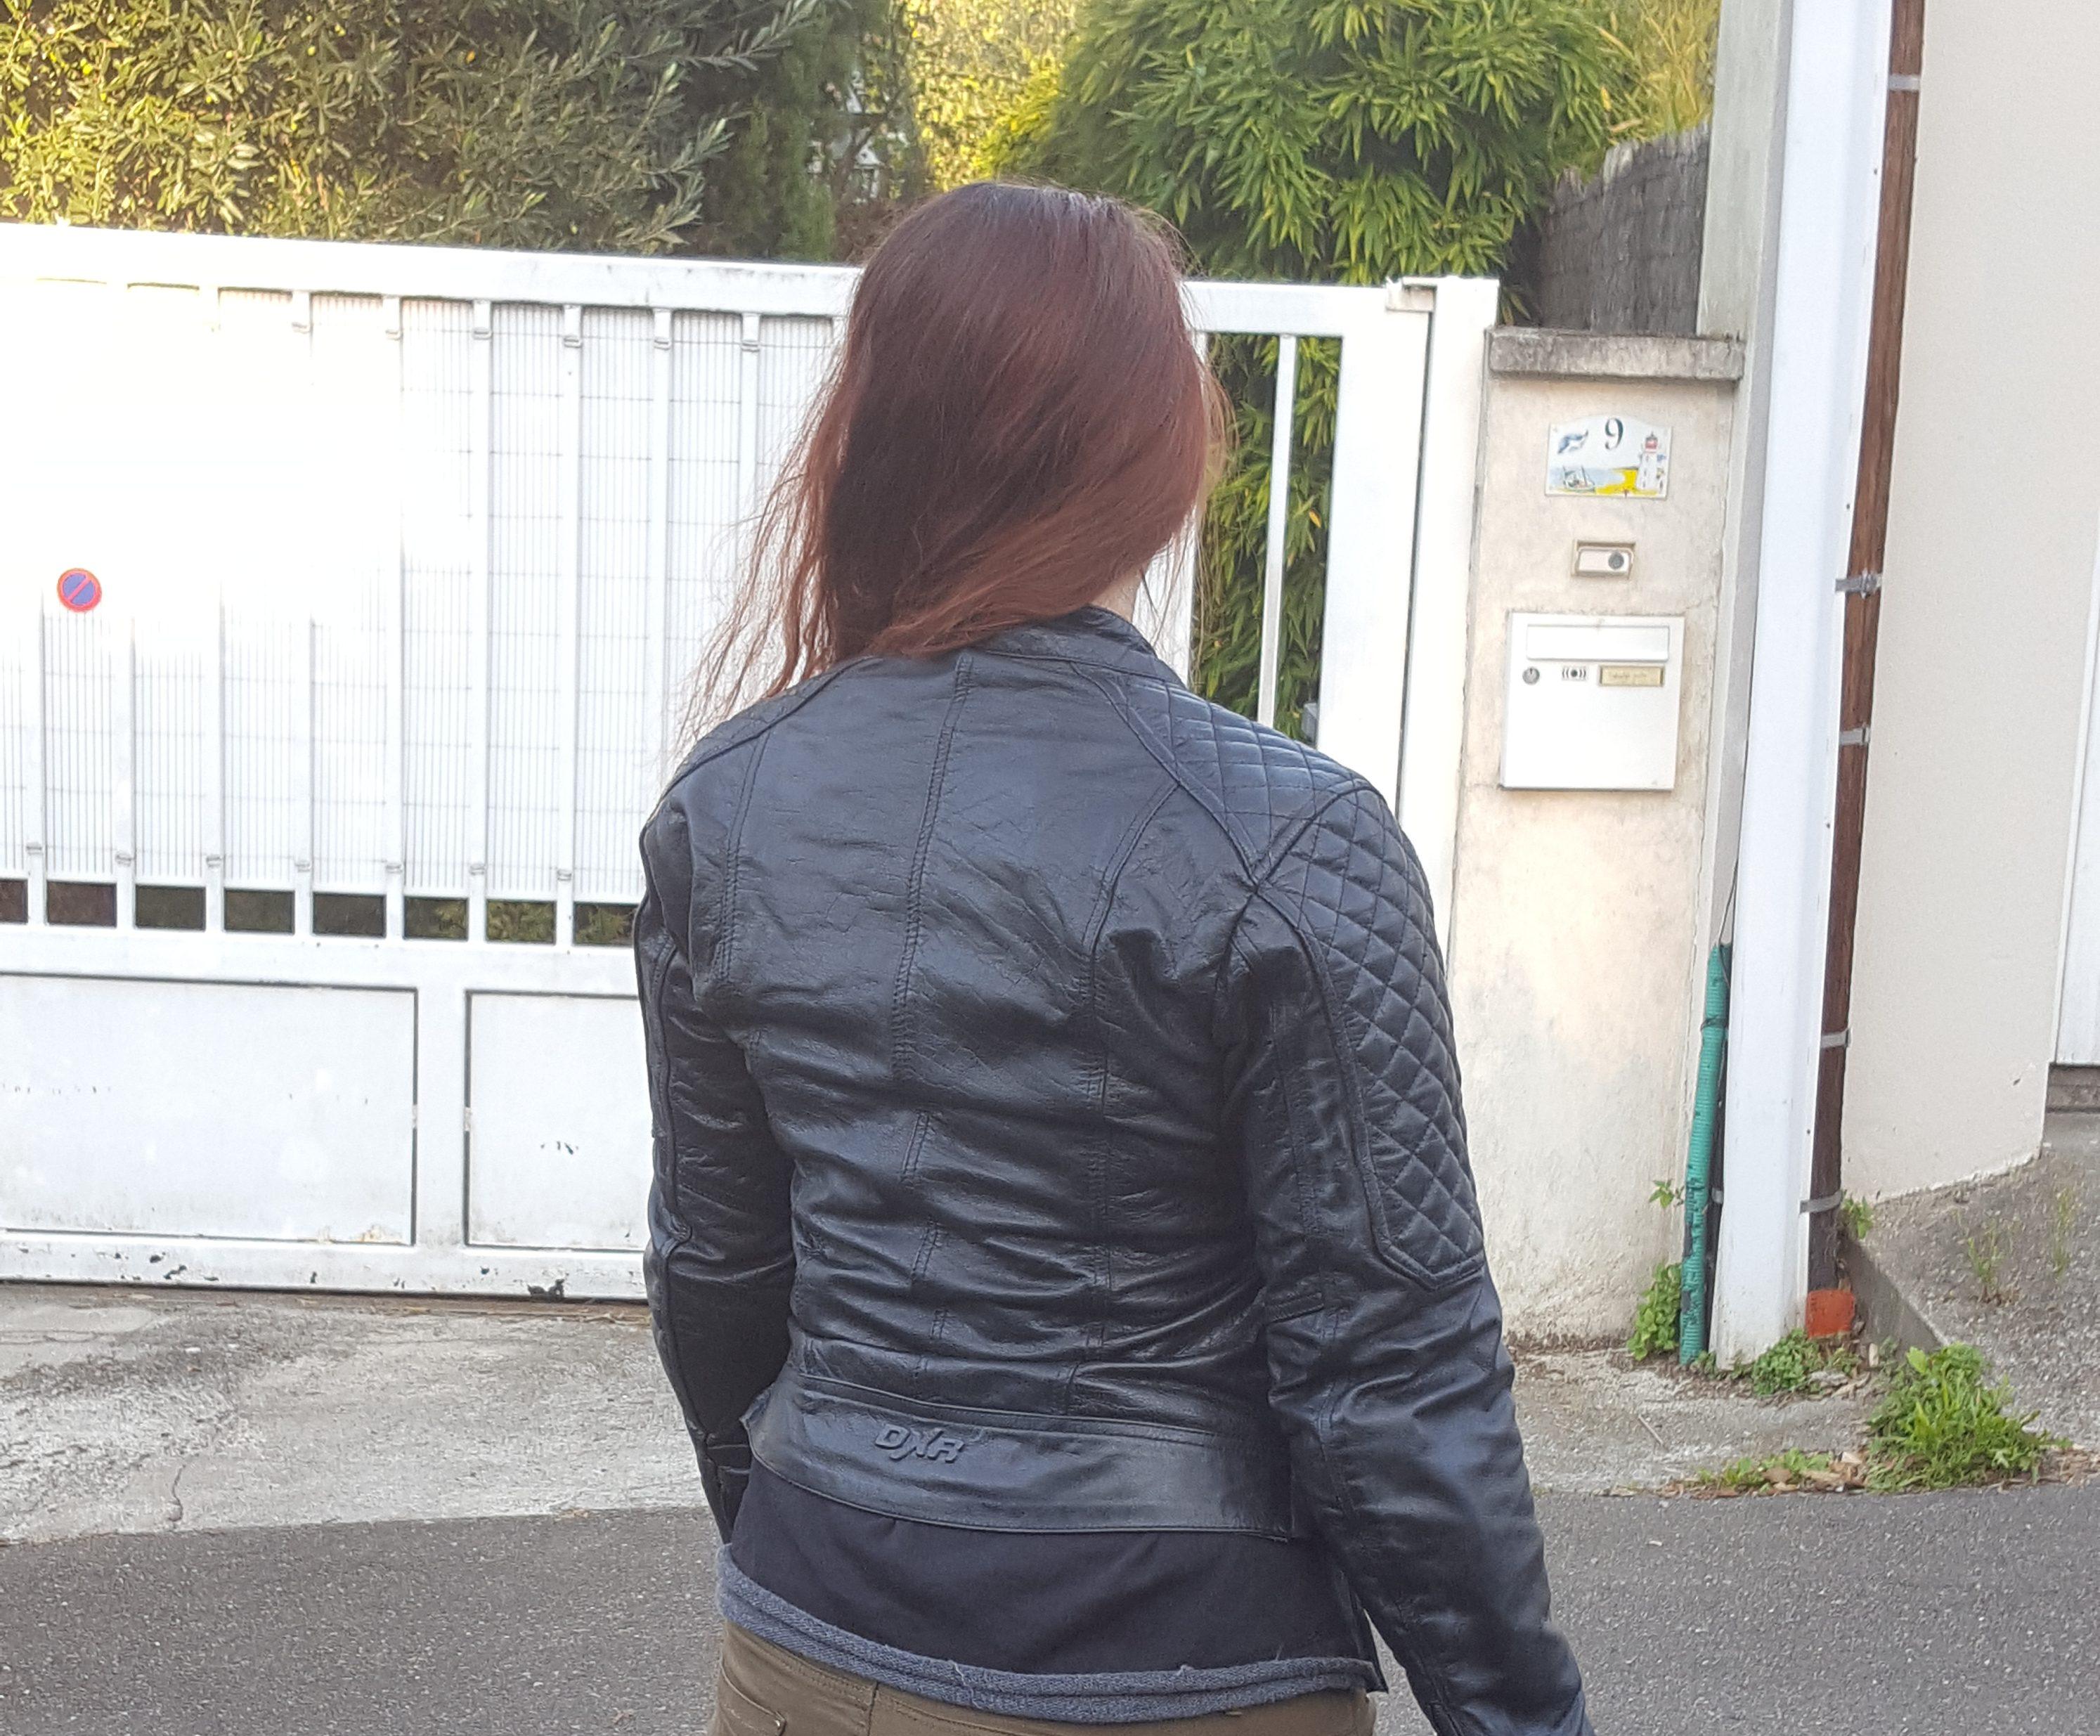 cuero azul chaqueta dxr diana